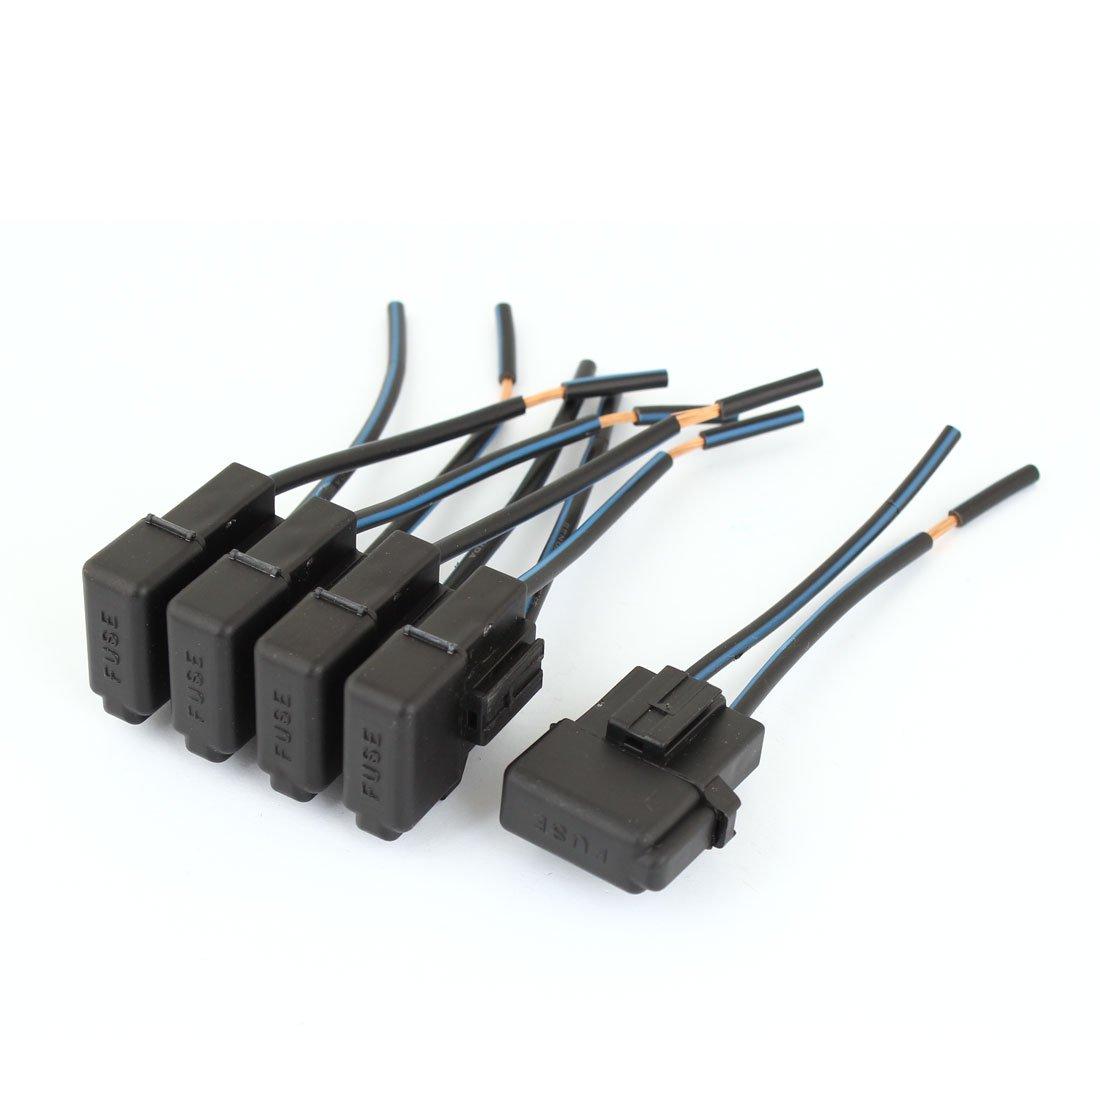 5PCS Car Automotive Audio Inline ATC Vane Inline Fuse Holder DC 12V uxcell a13051300ux0369